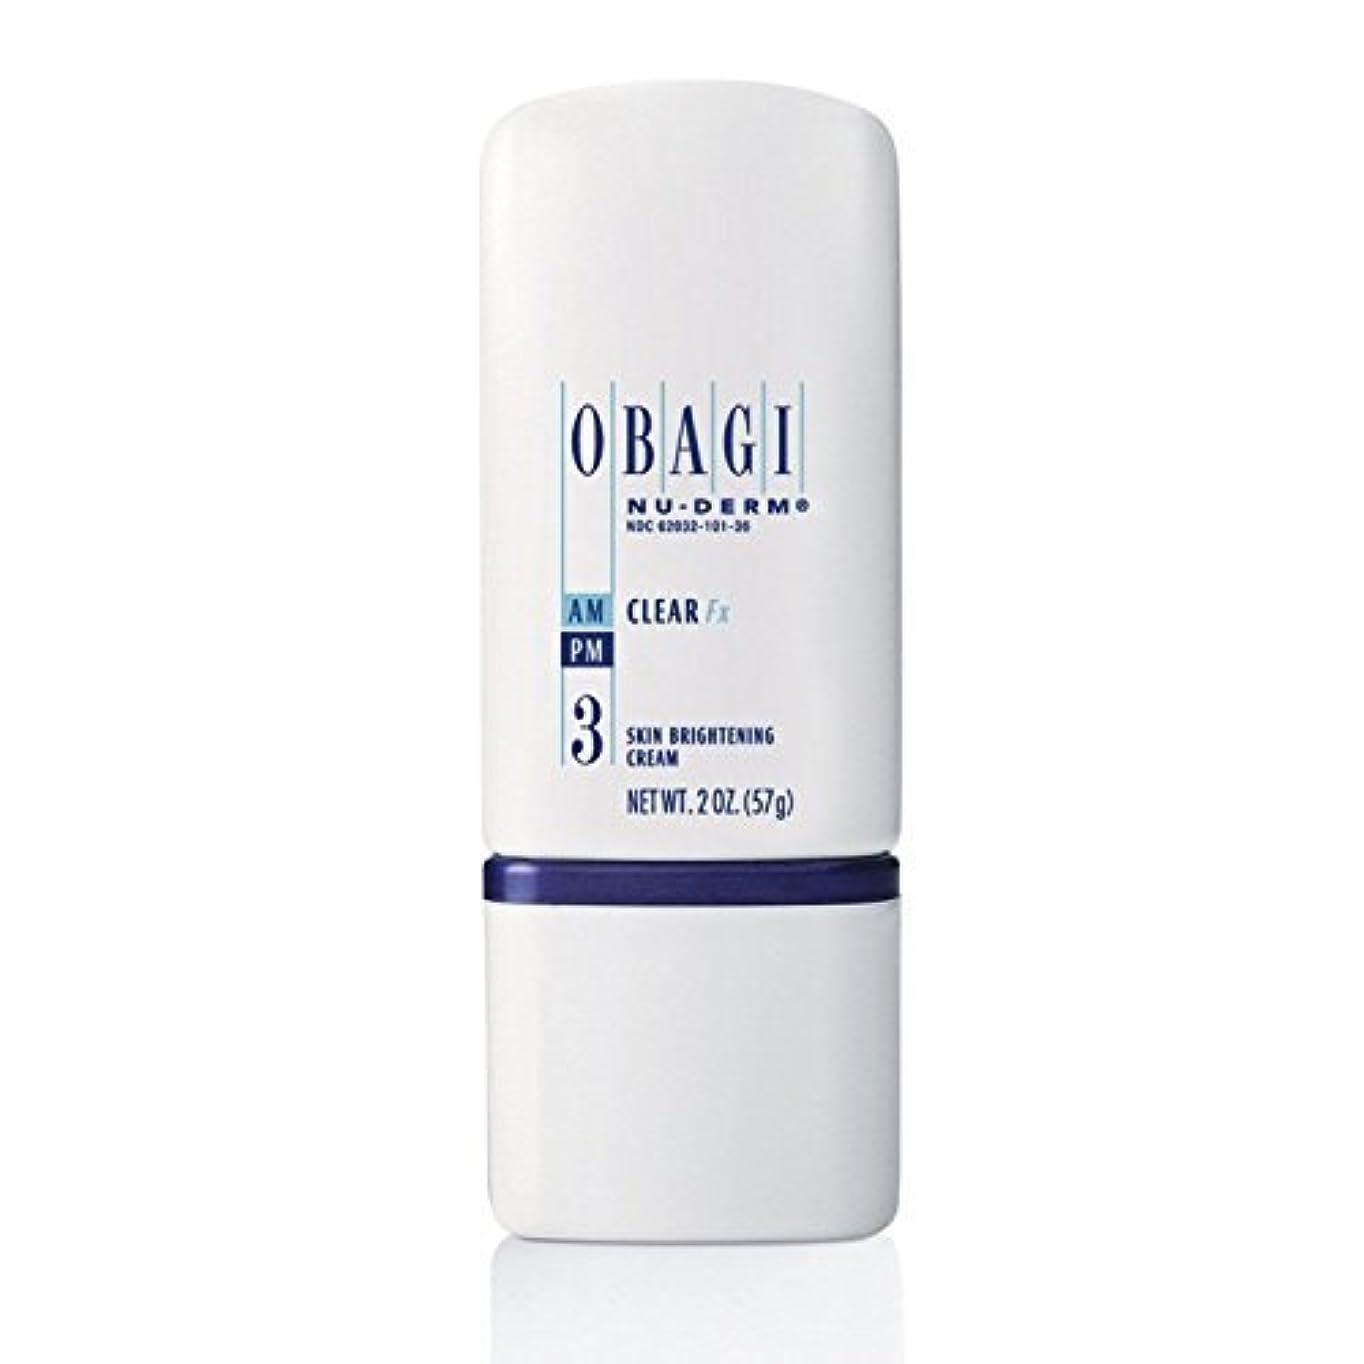 Obagi Nu-derm Clear Fx 2 Oz New Care the Skin by 360 Skin Care [並行輸入品]